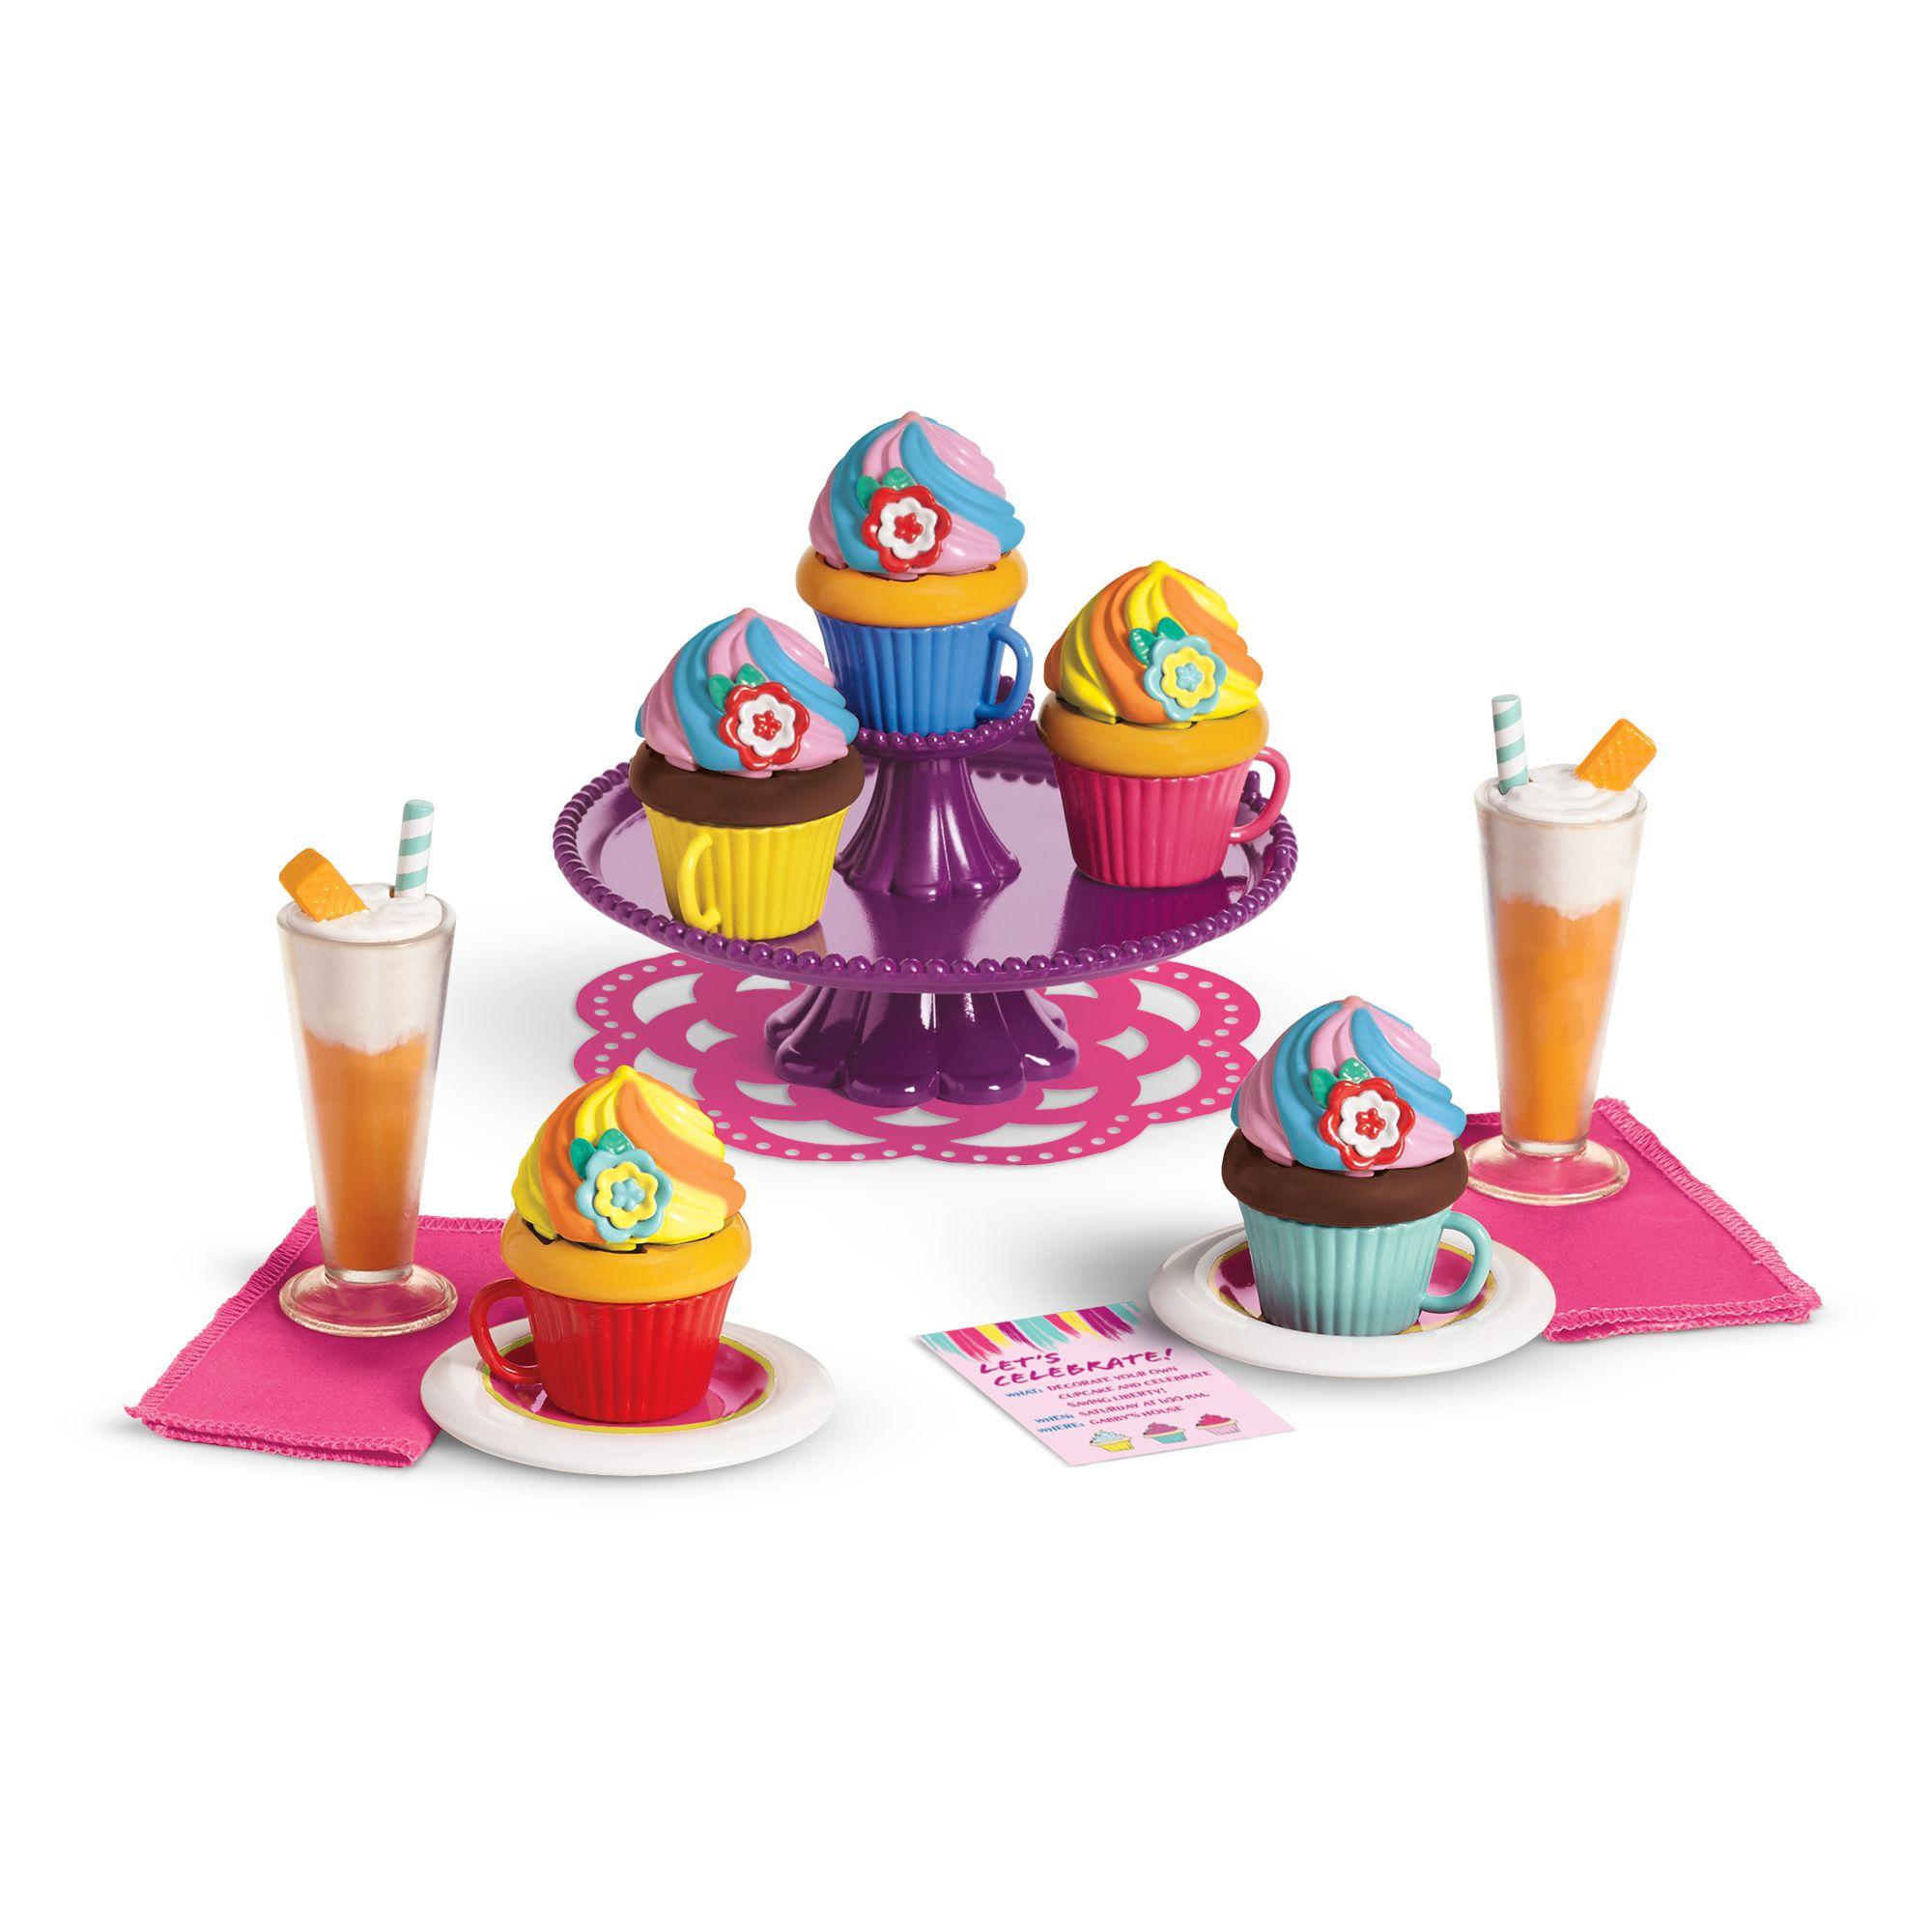 Gabriela's Colorful Cupcake Set